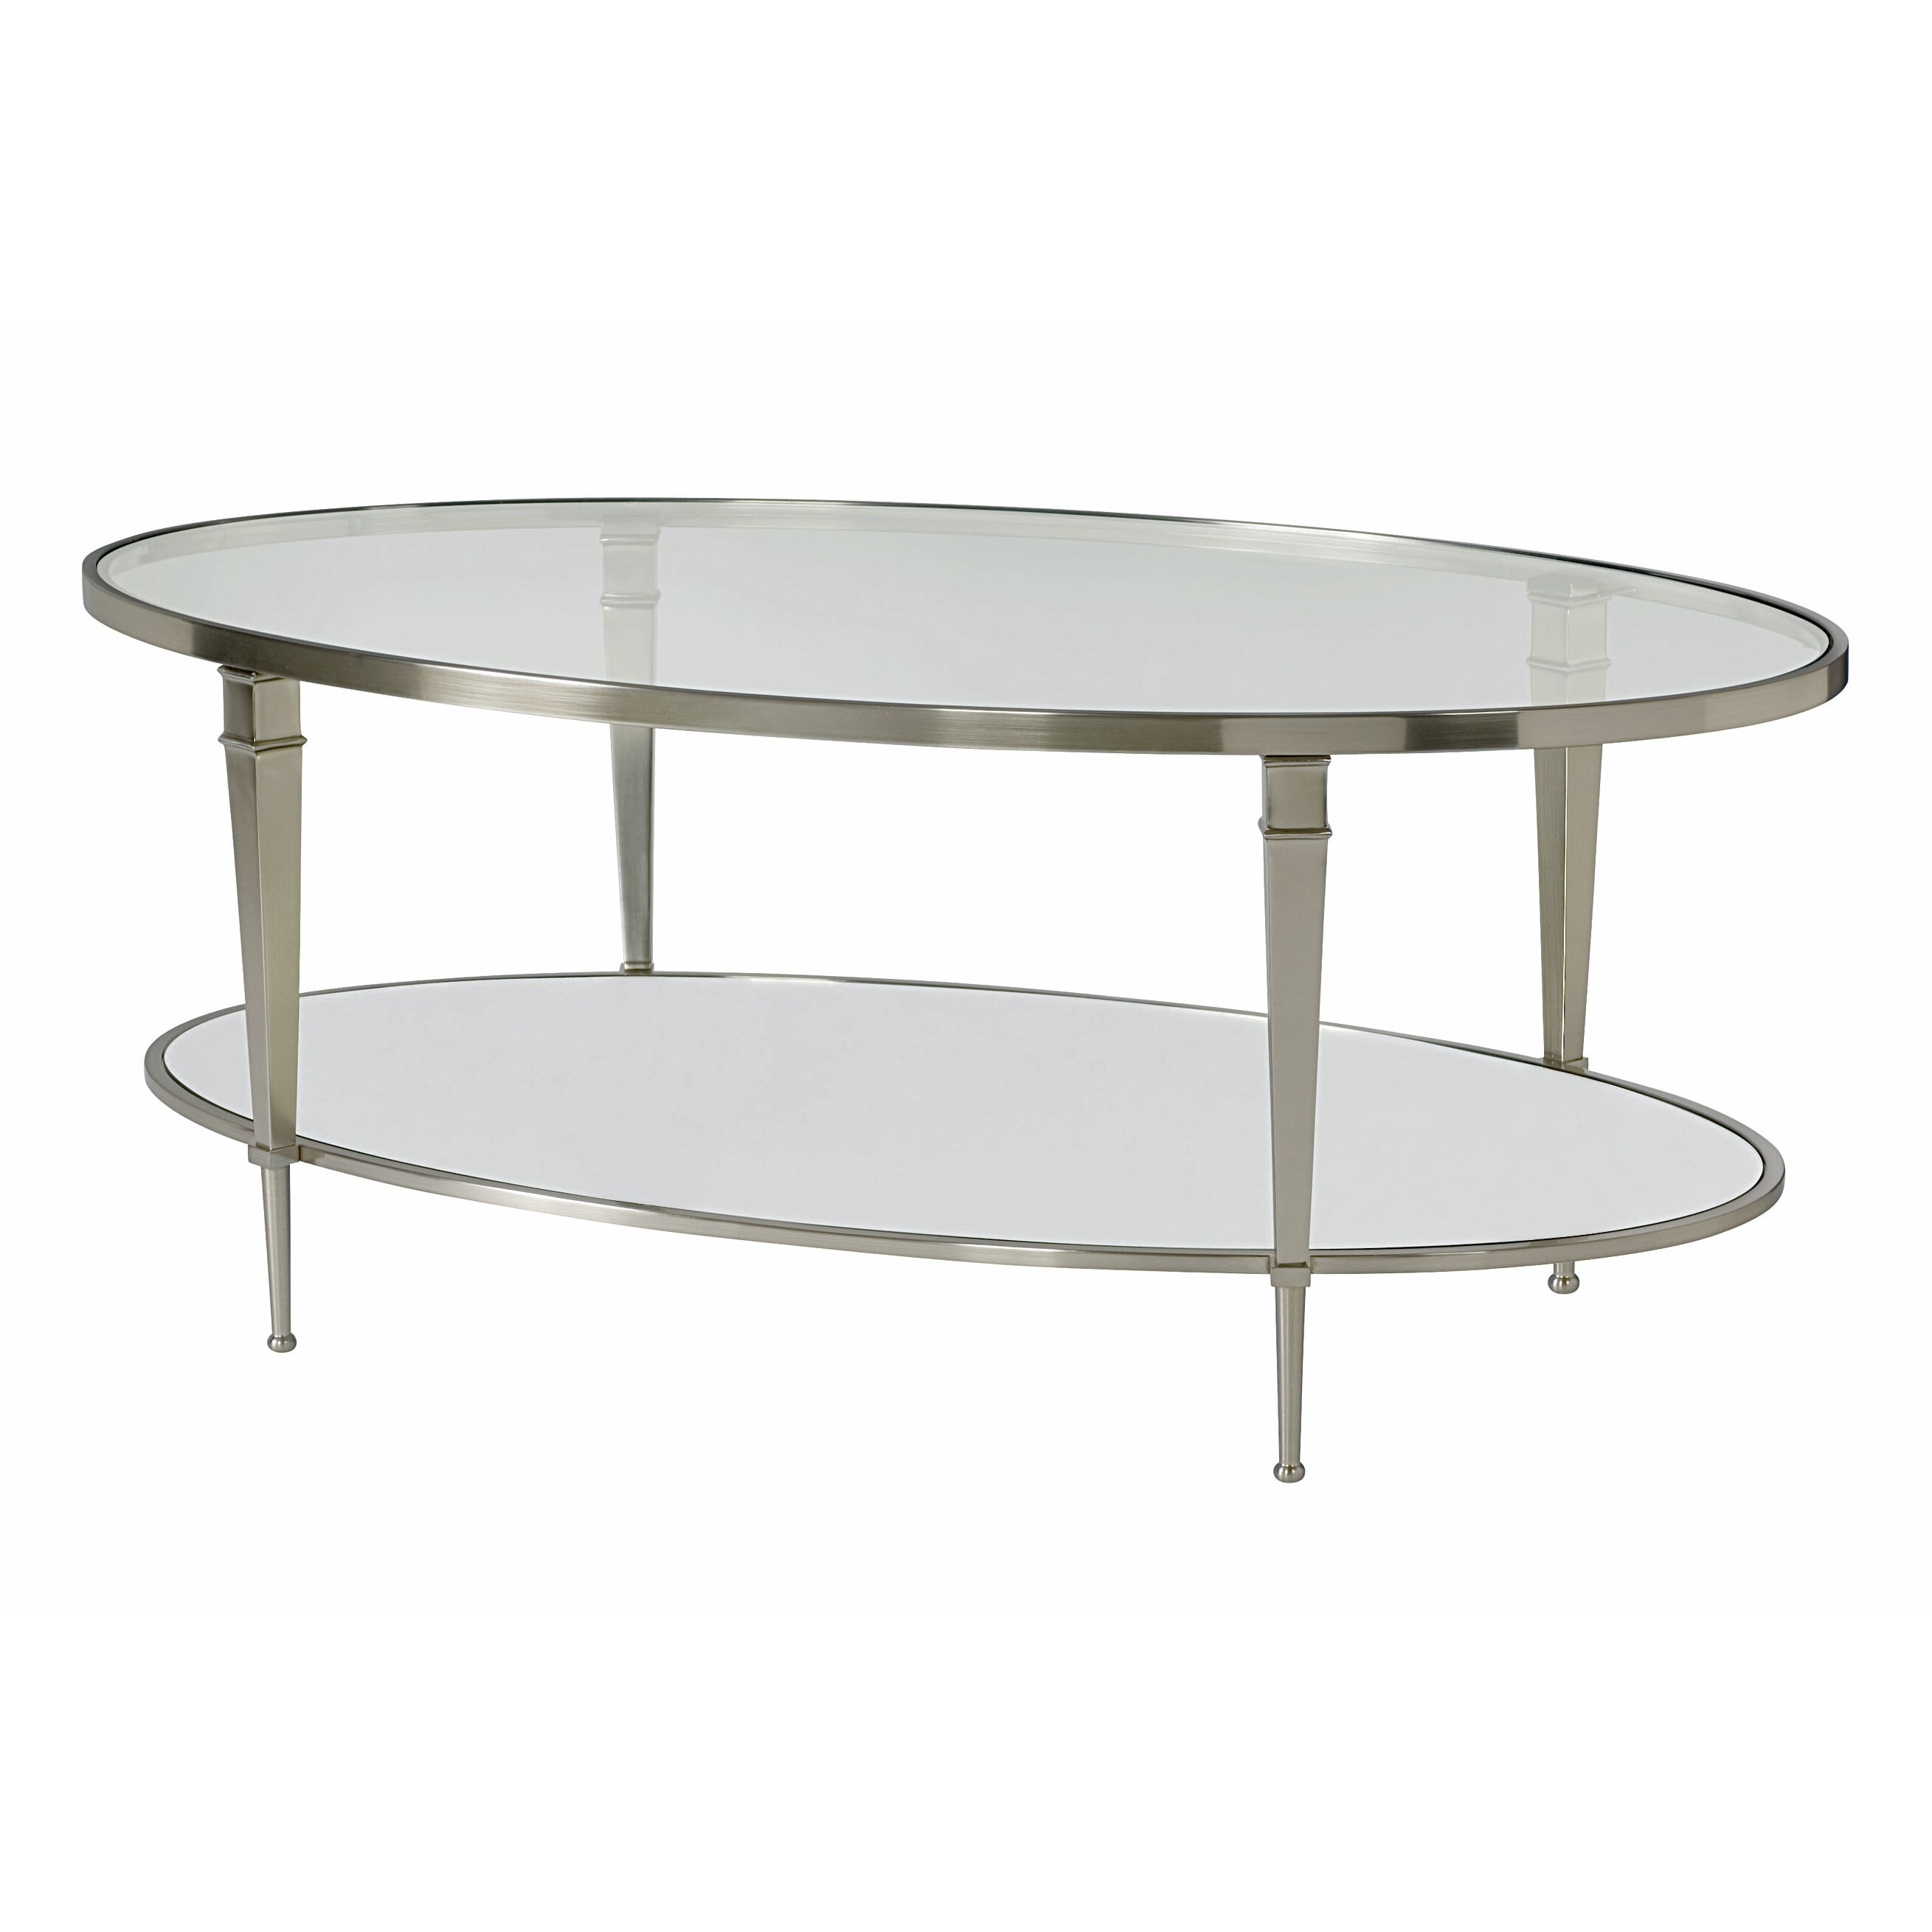 mallory coffee table wayfair. Black Bedroom Furniture Sets. Home Design Ideas